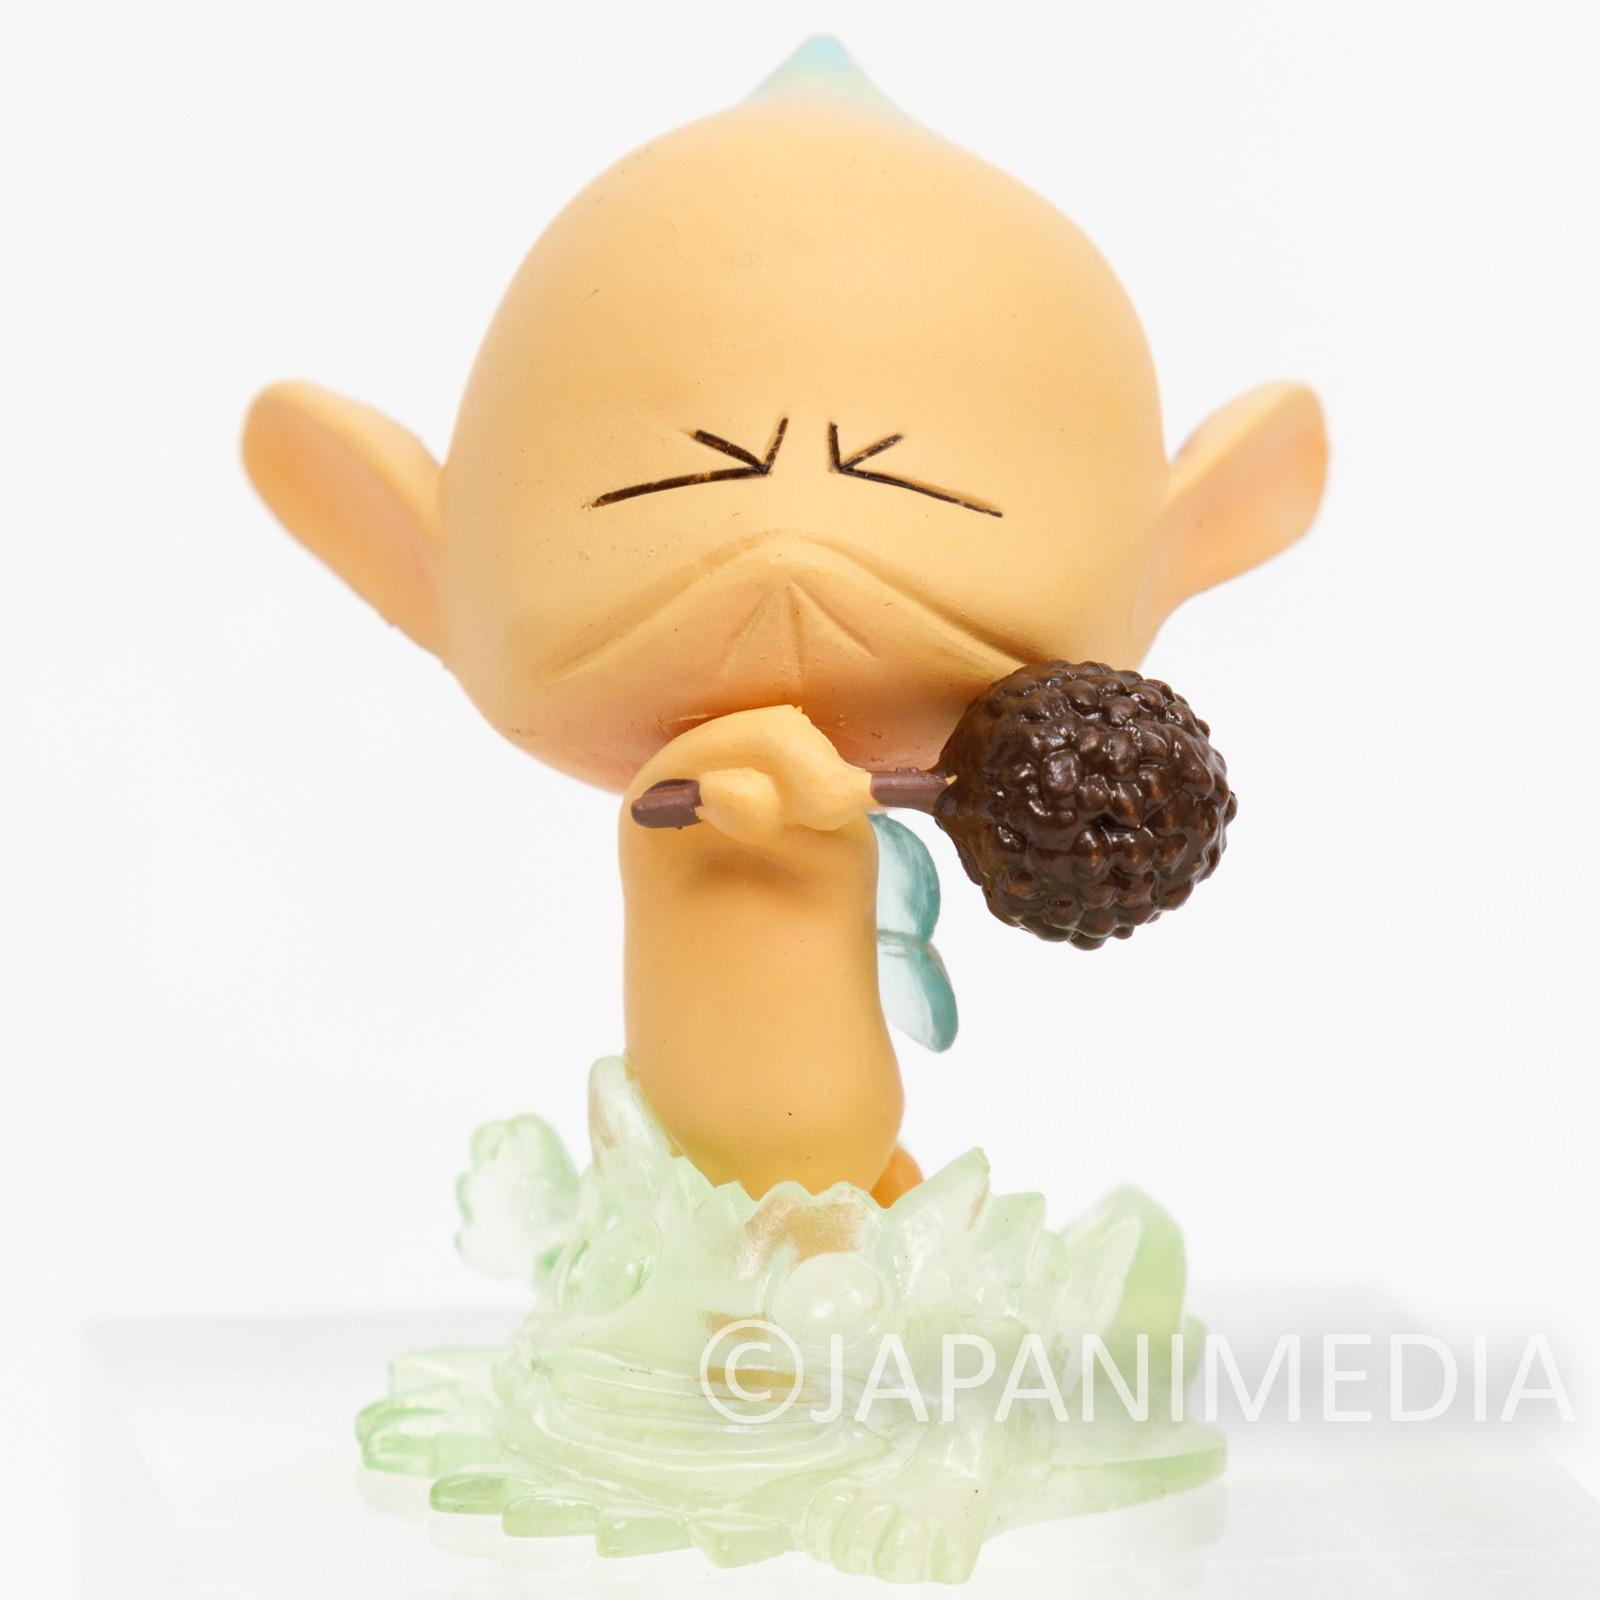 Berserk Puck Deformed Figure Collection JAPAN ANIME MANGA